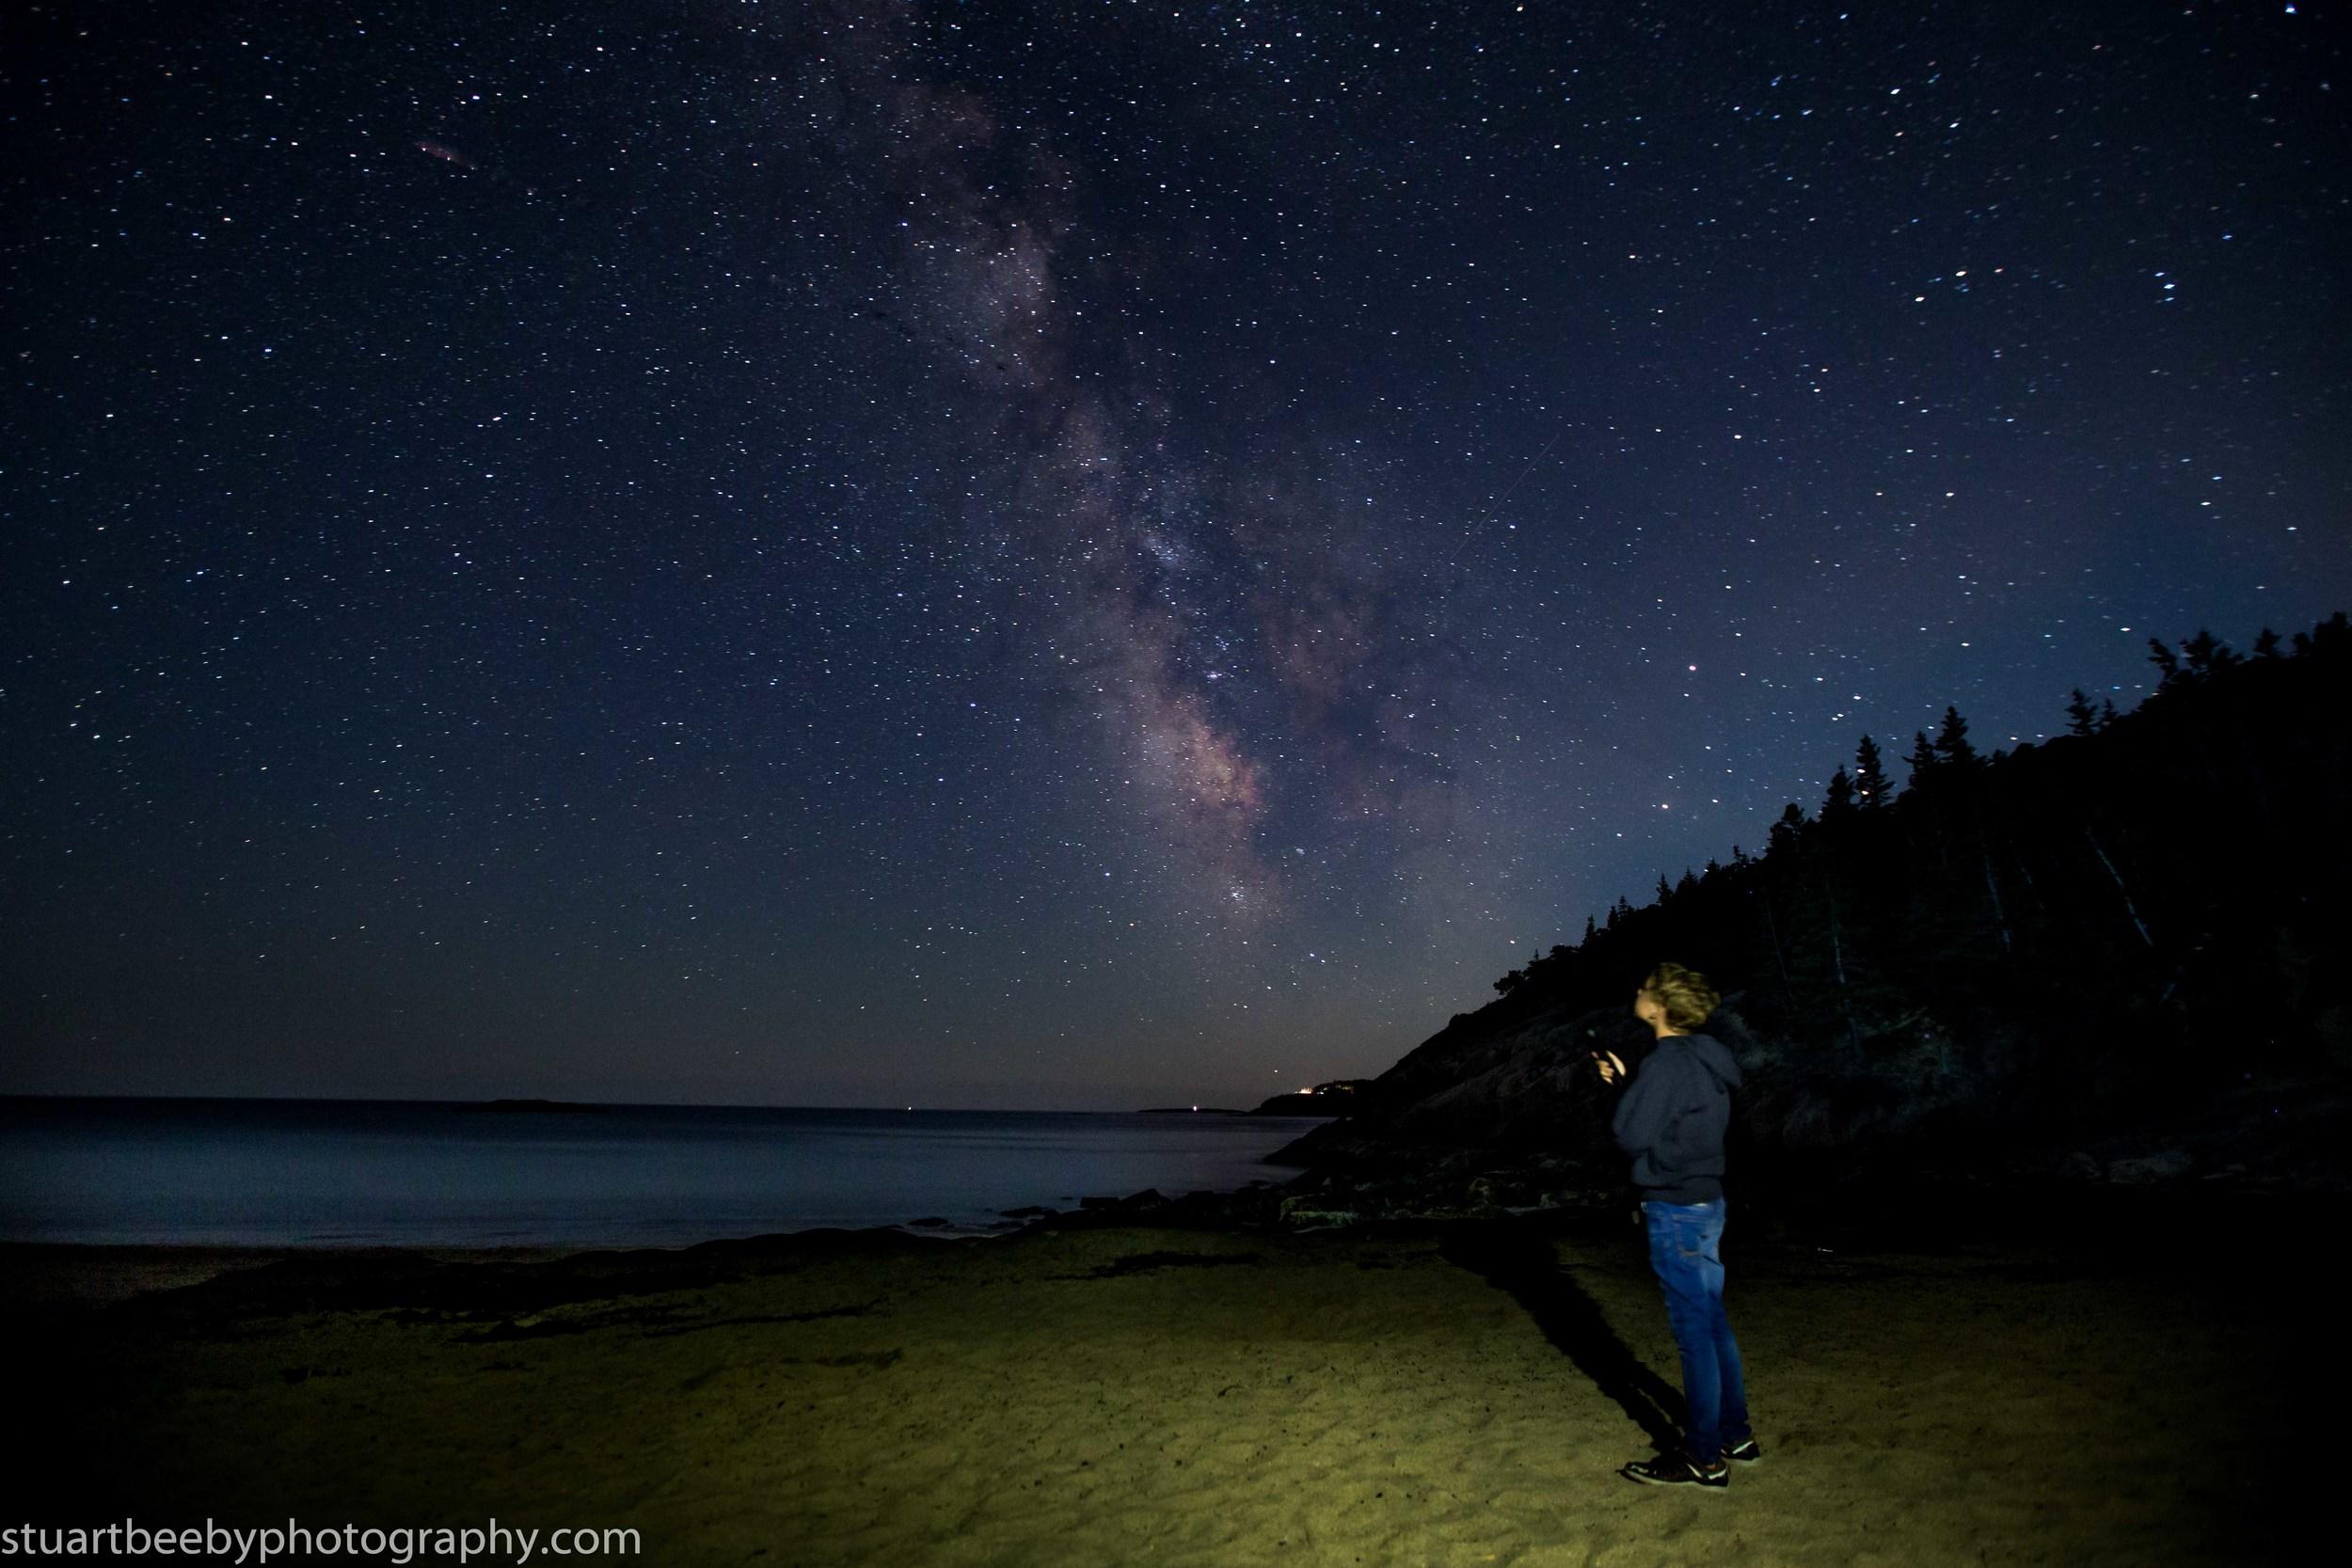 Oliver star gazing on Sand Beach, Acadia National Park